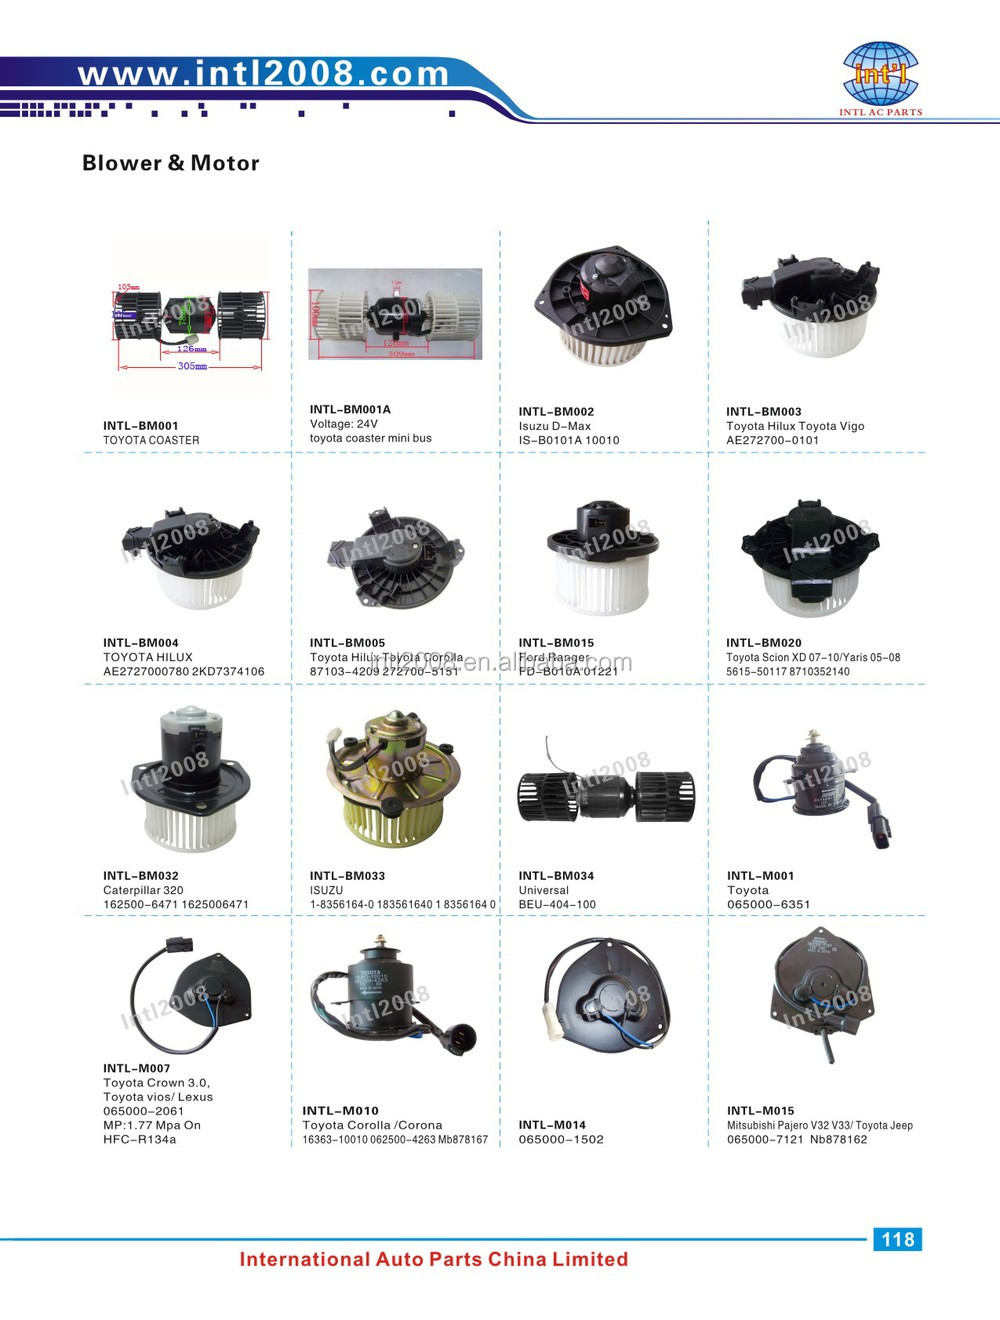 Blower motor for nissan frontier almera sentra subaru for 2008 subaru impreza blower motor